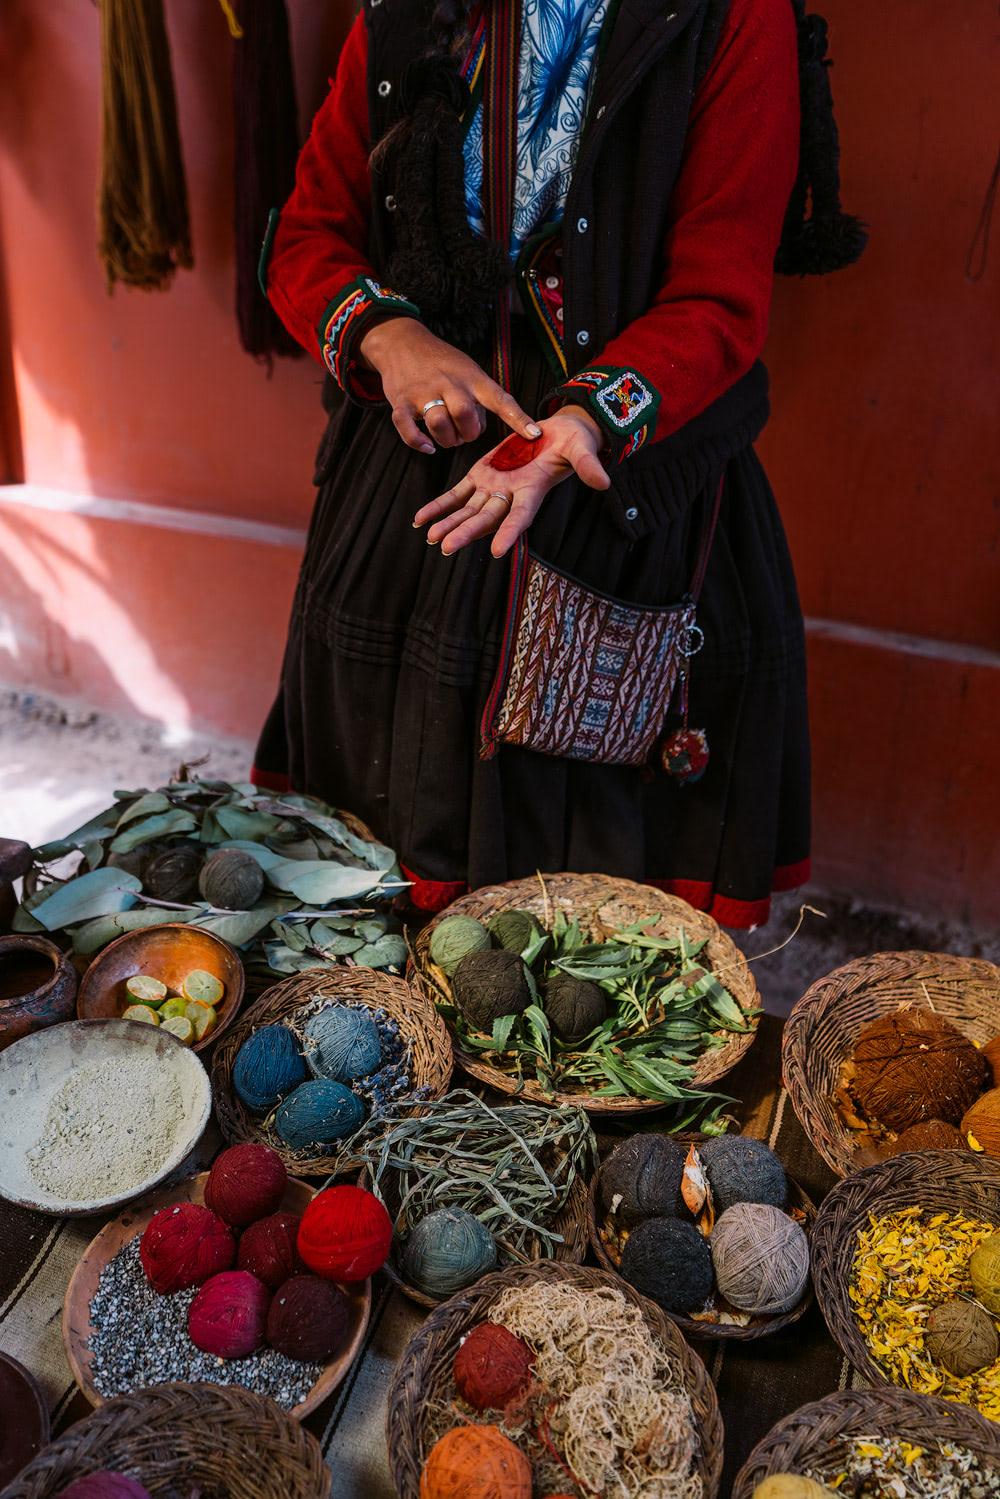 Best-Things-To-Do-In-And-Around-Cusco-Peru-Chinchero-Markets02